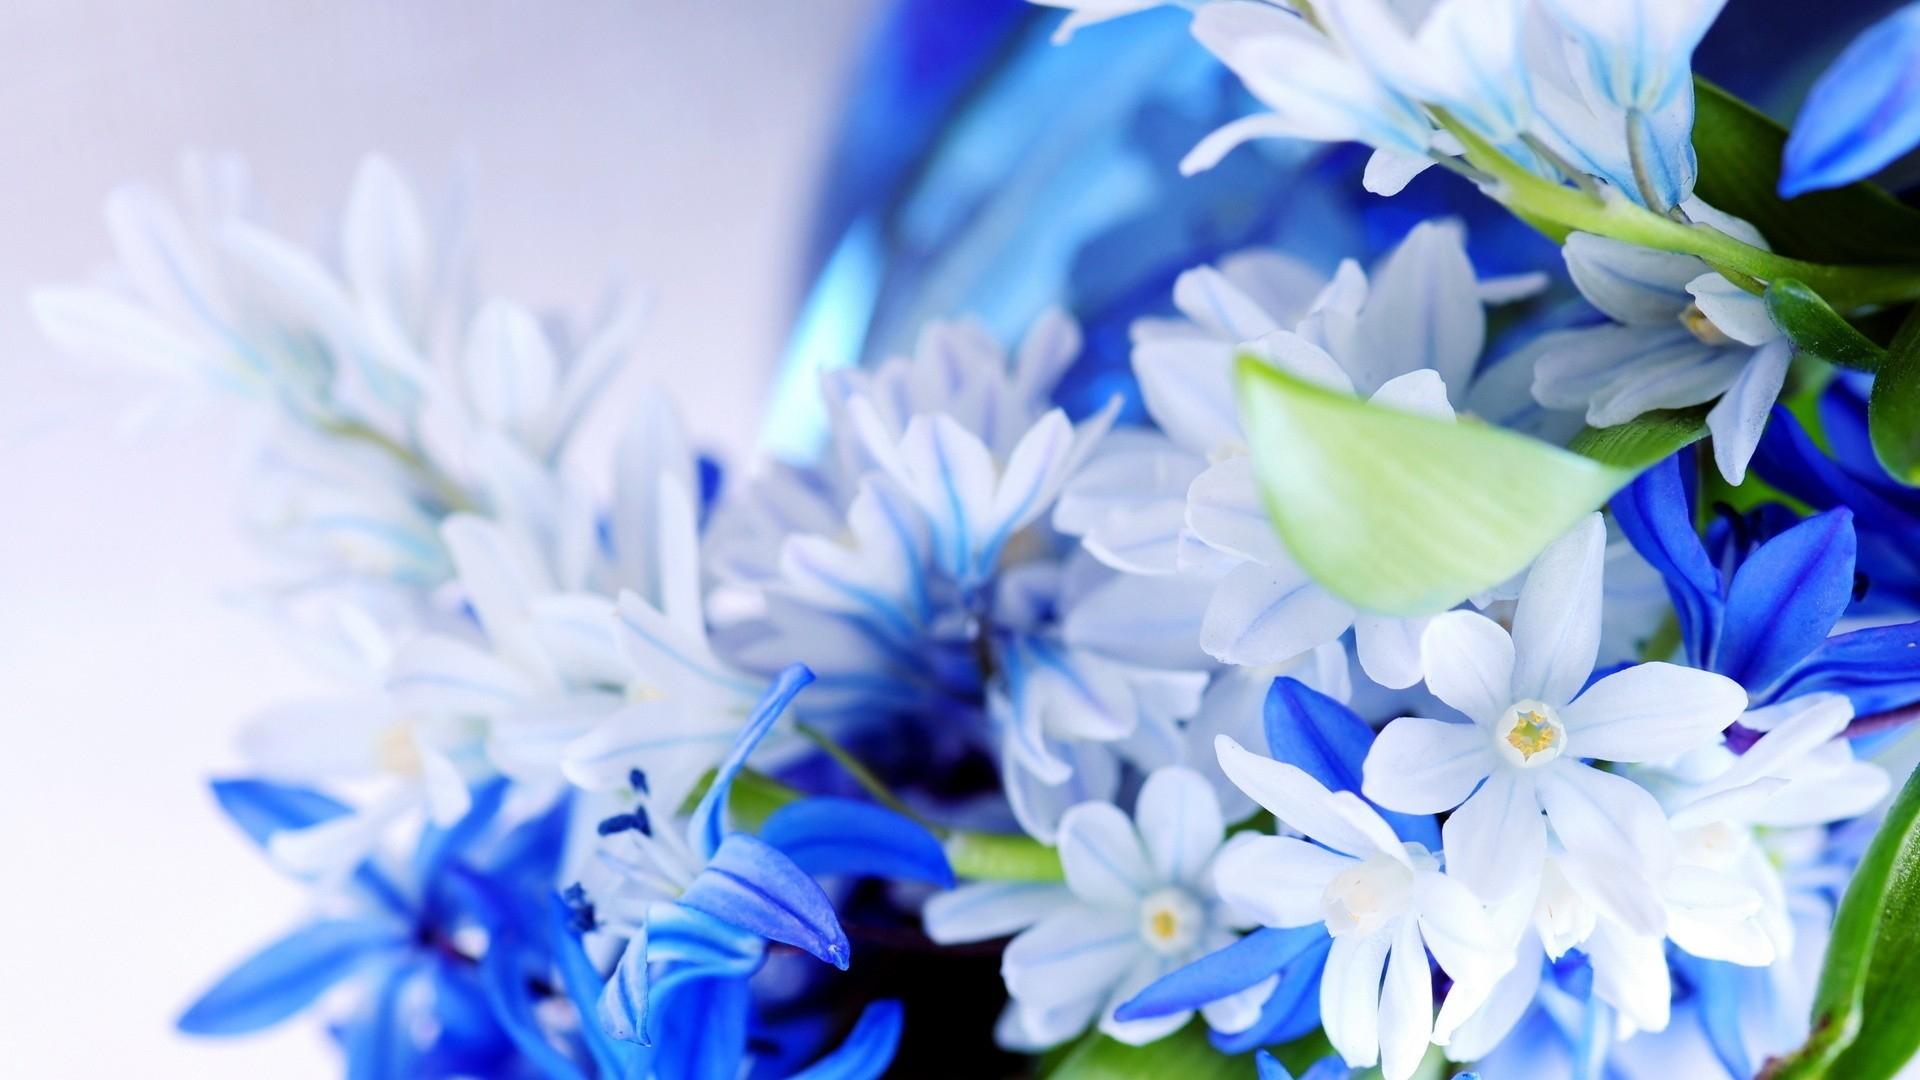 Wallpaper Flowers Plants Blue Blossom Beautiful Flora Petal